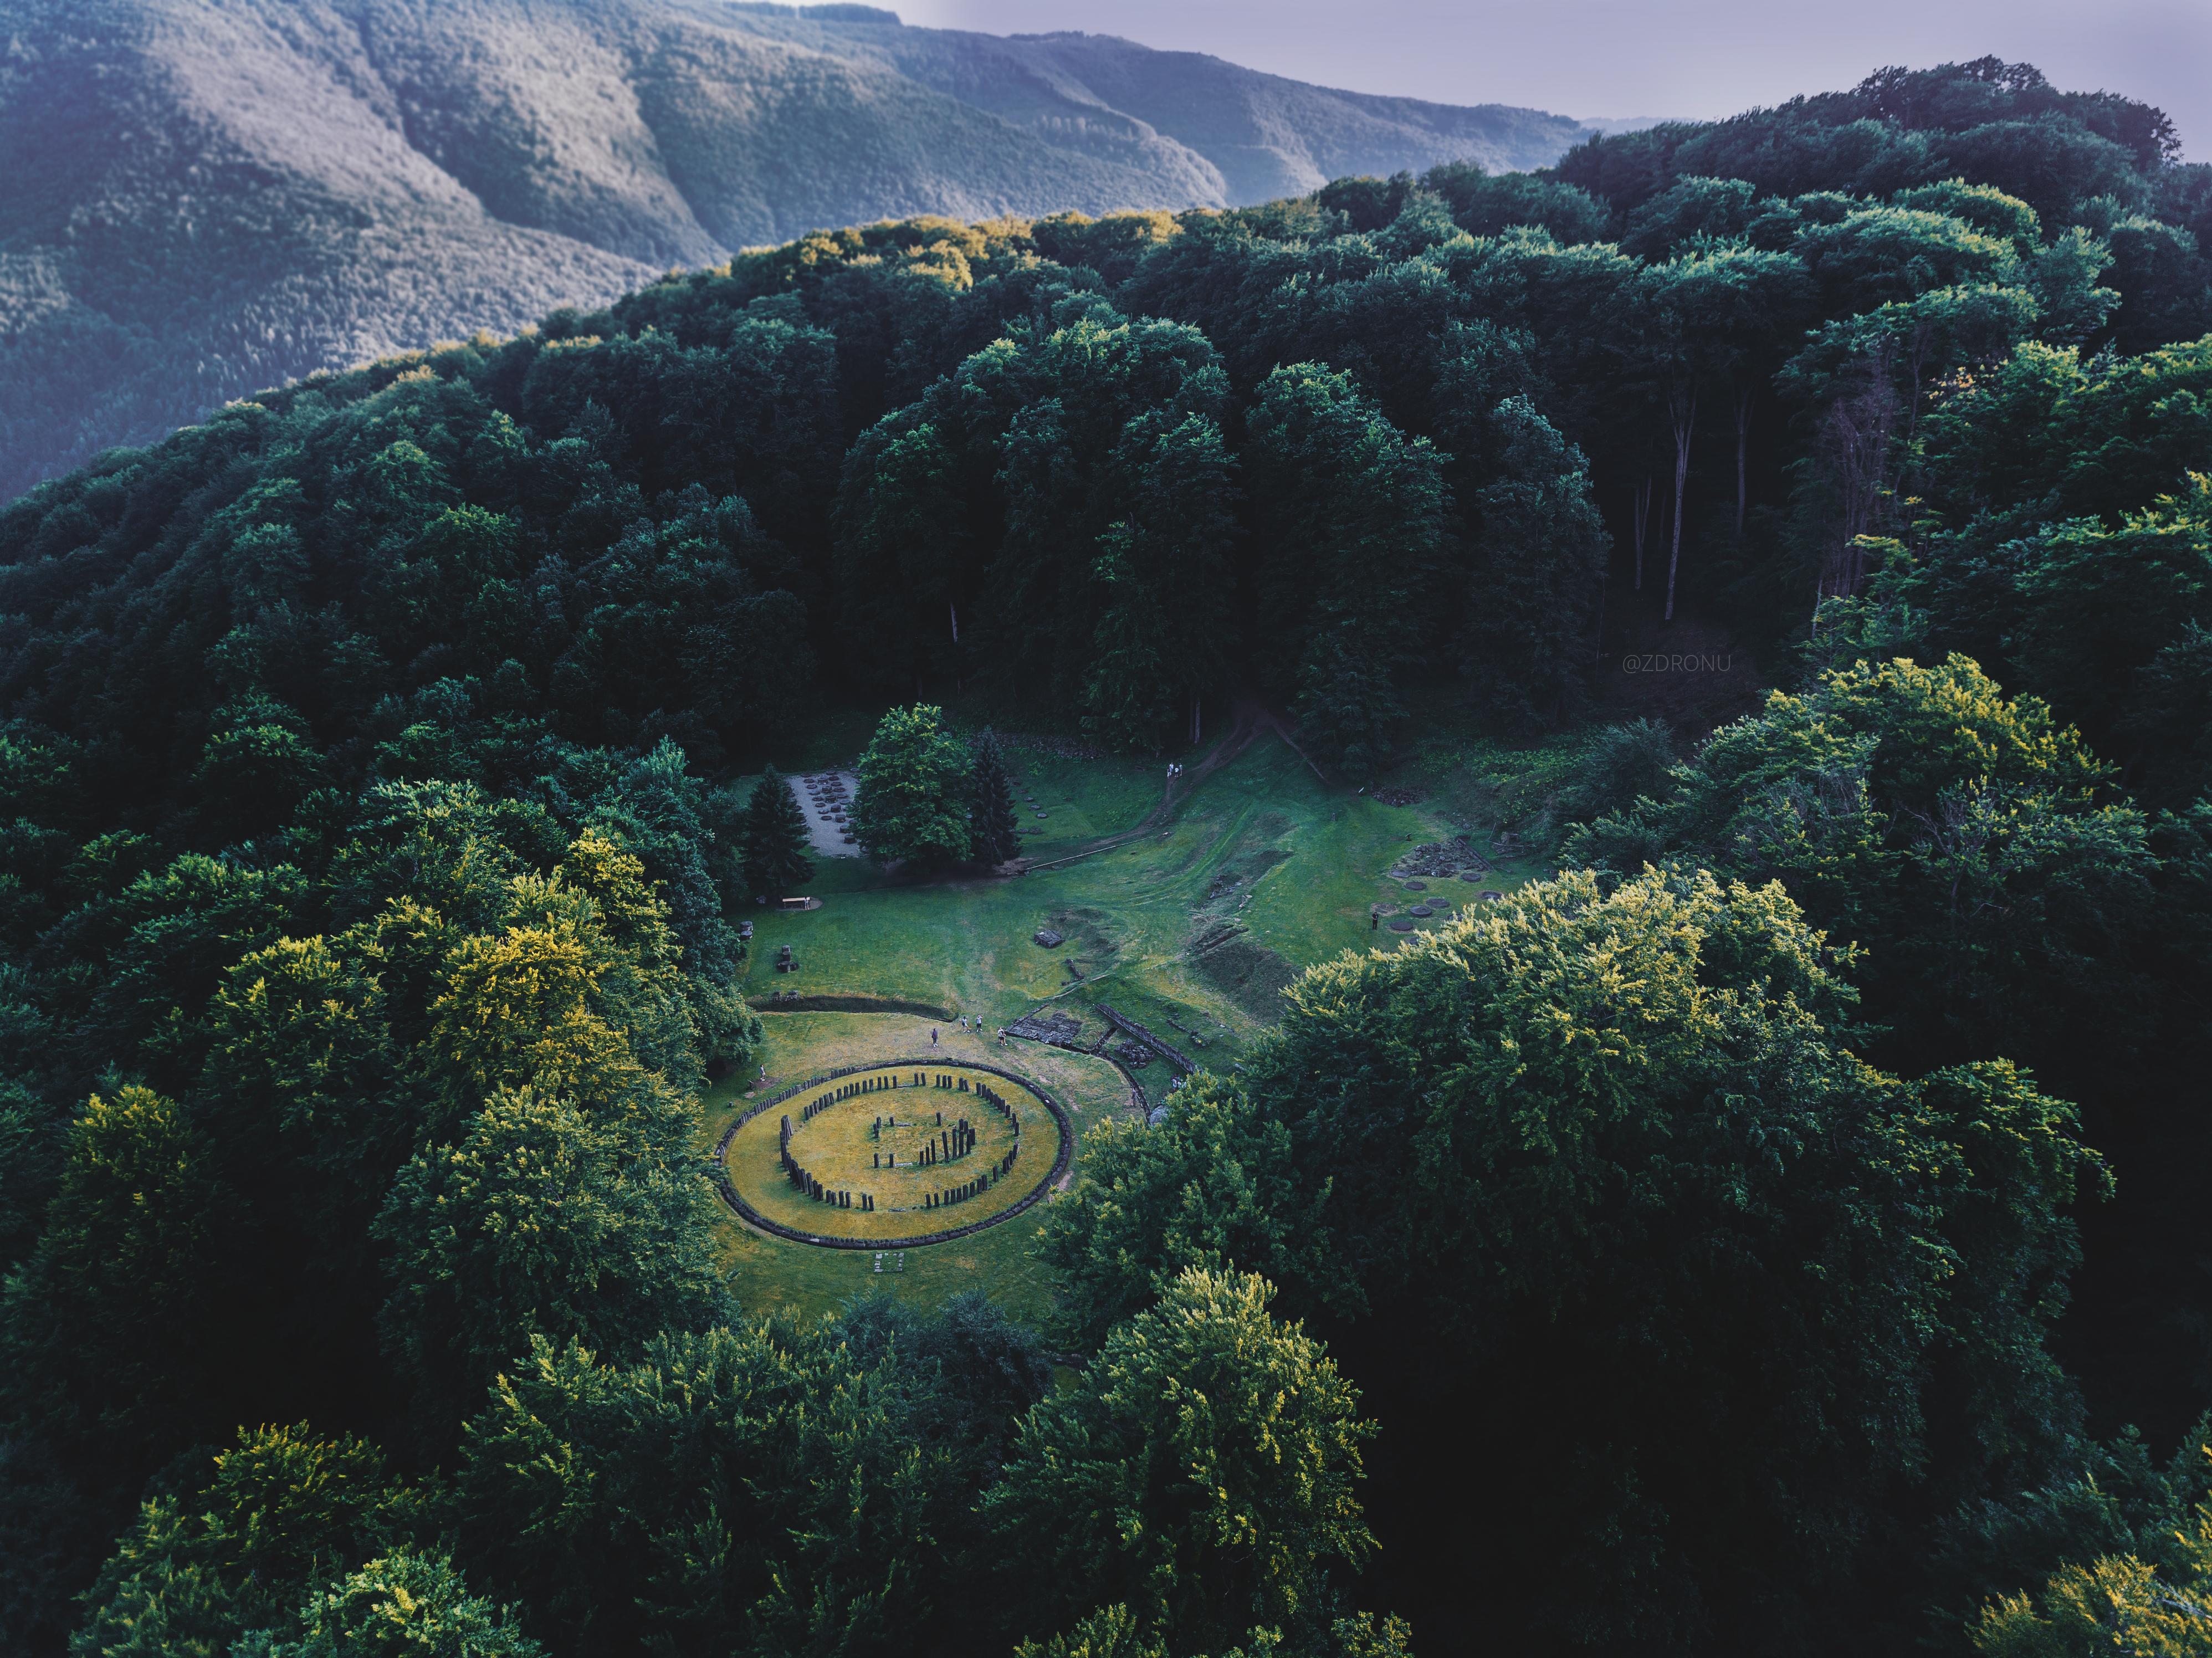 Rumunský Stonehange